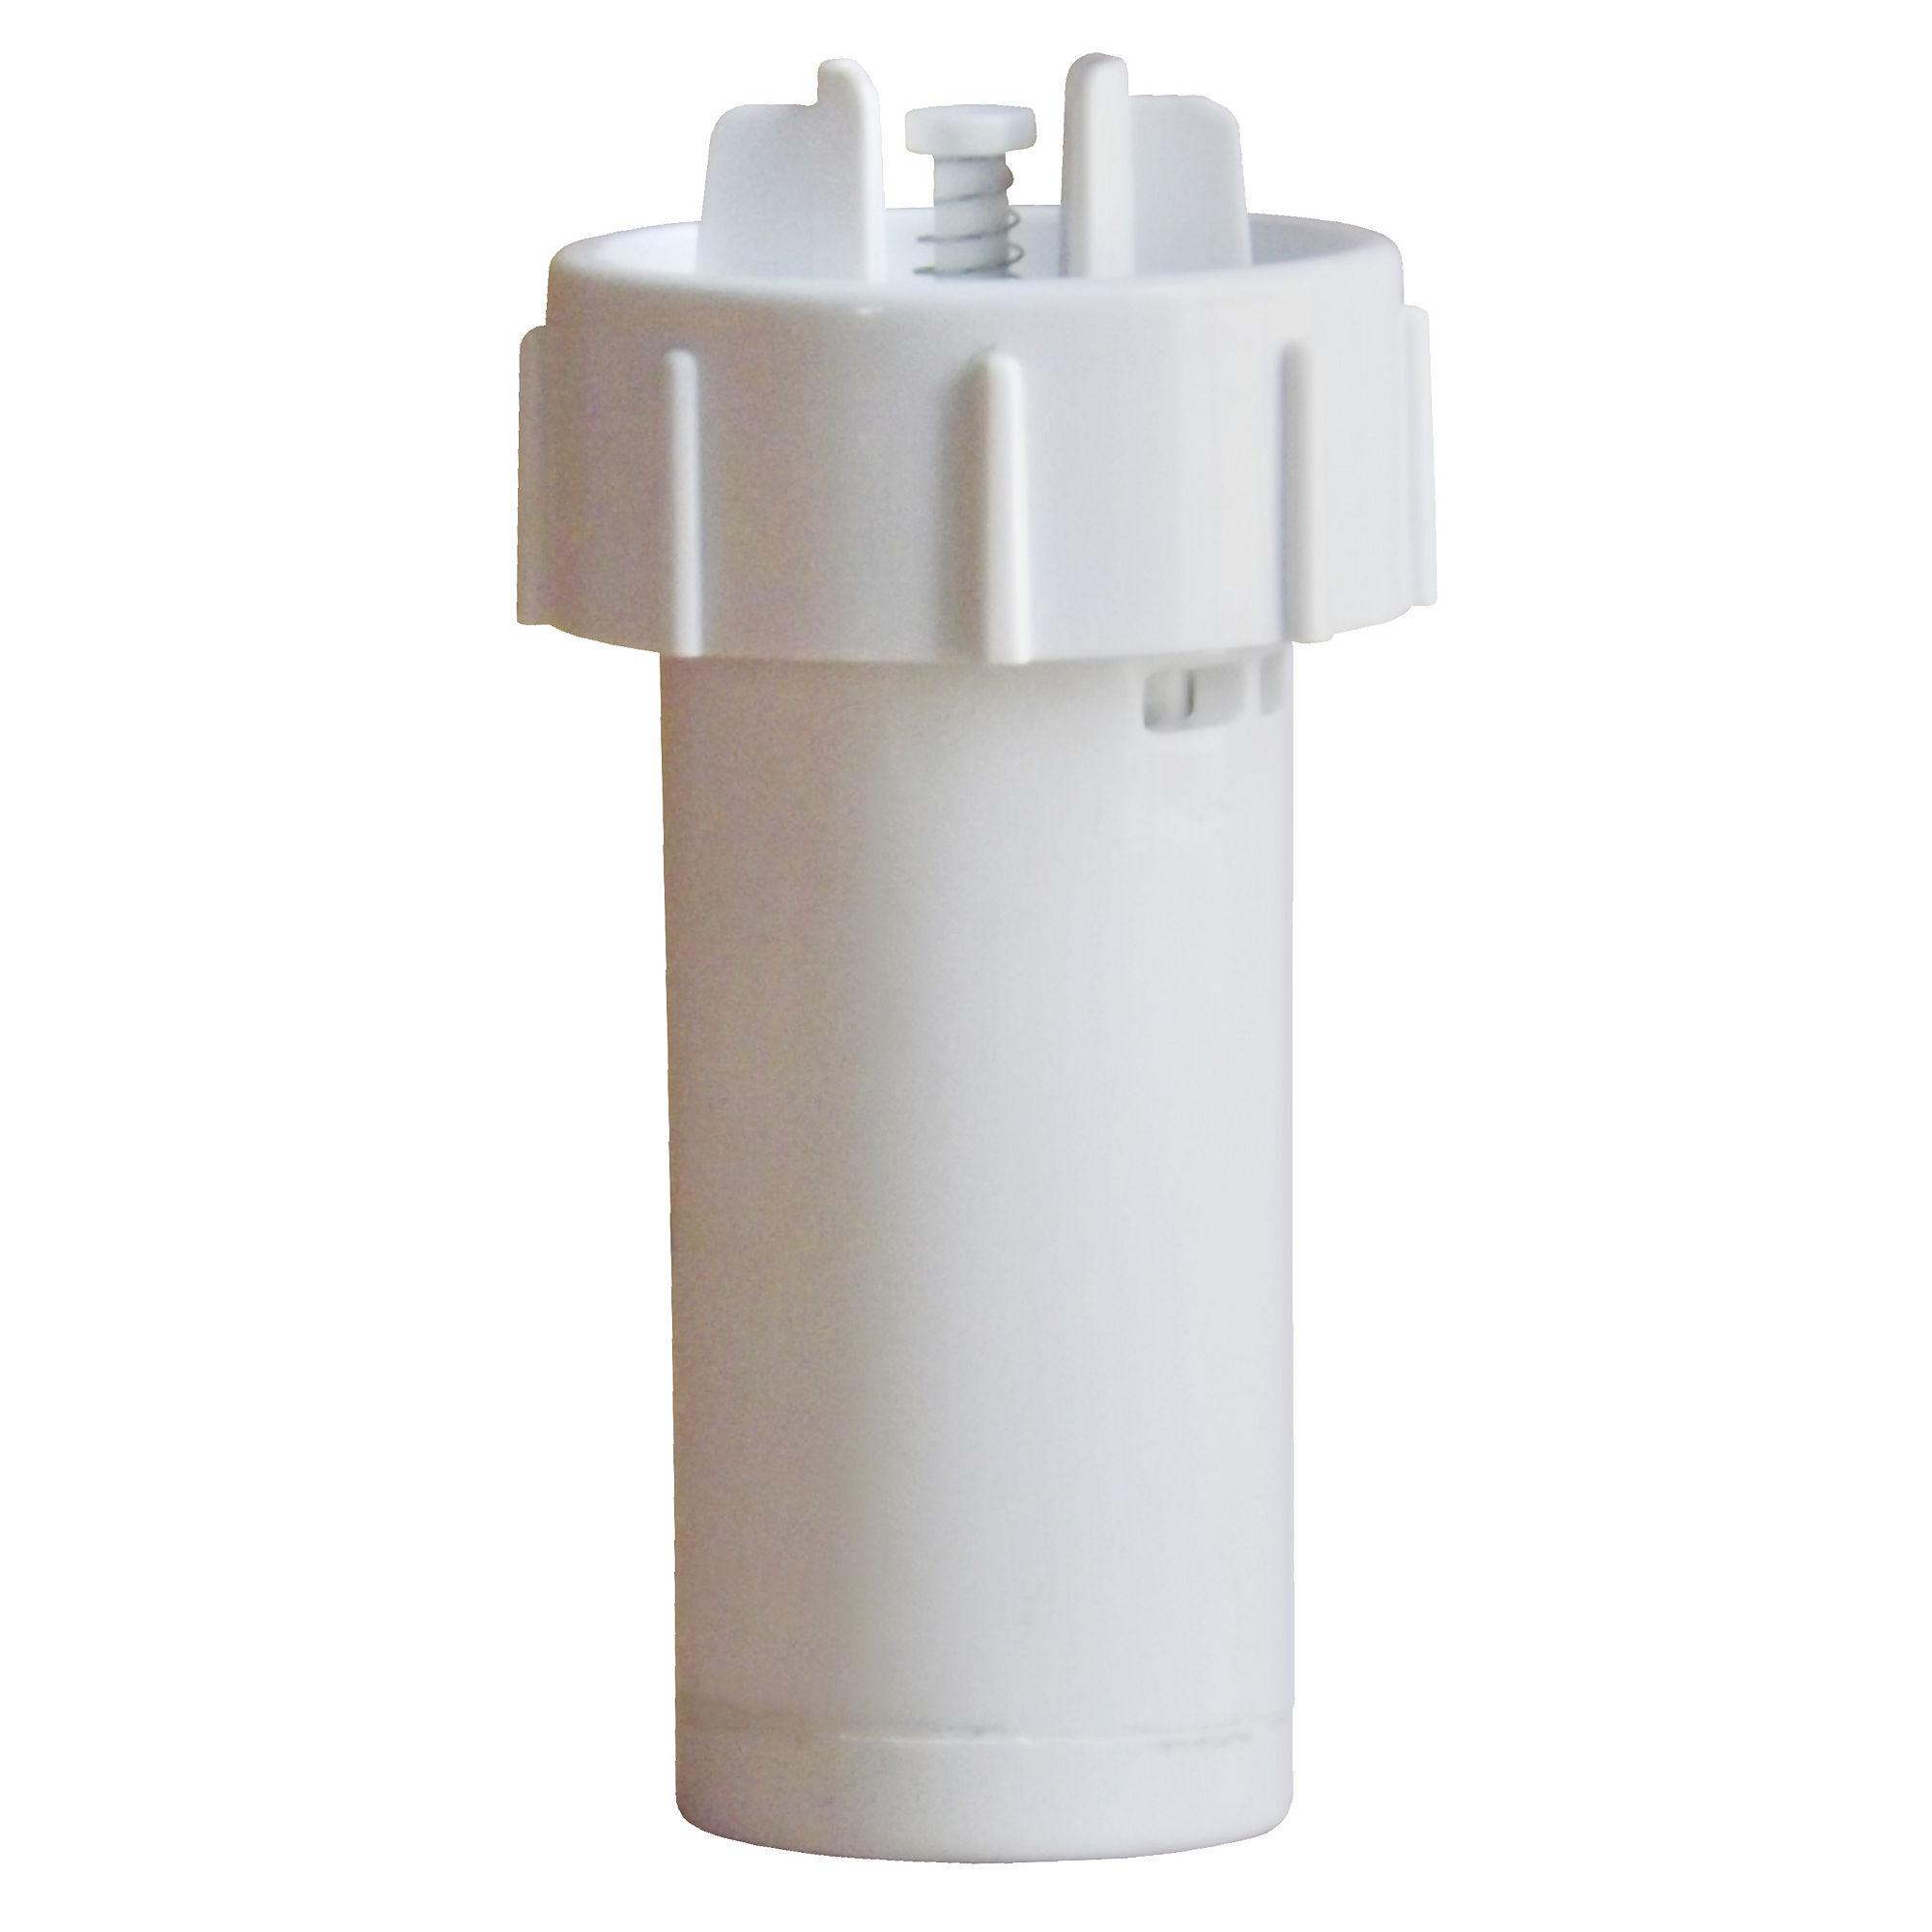 PUREGUARDIAN FLTDC30 Filter